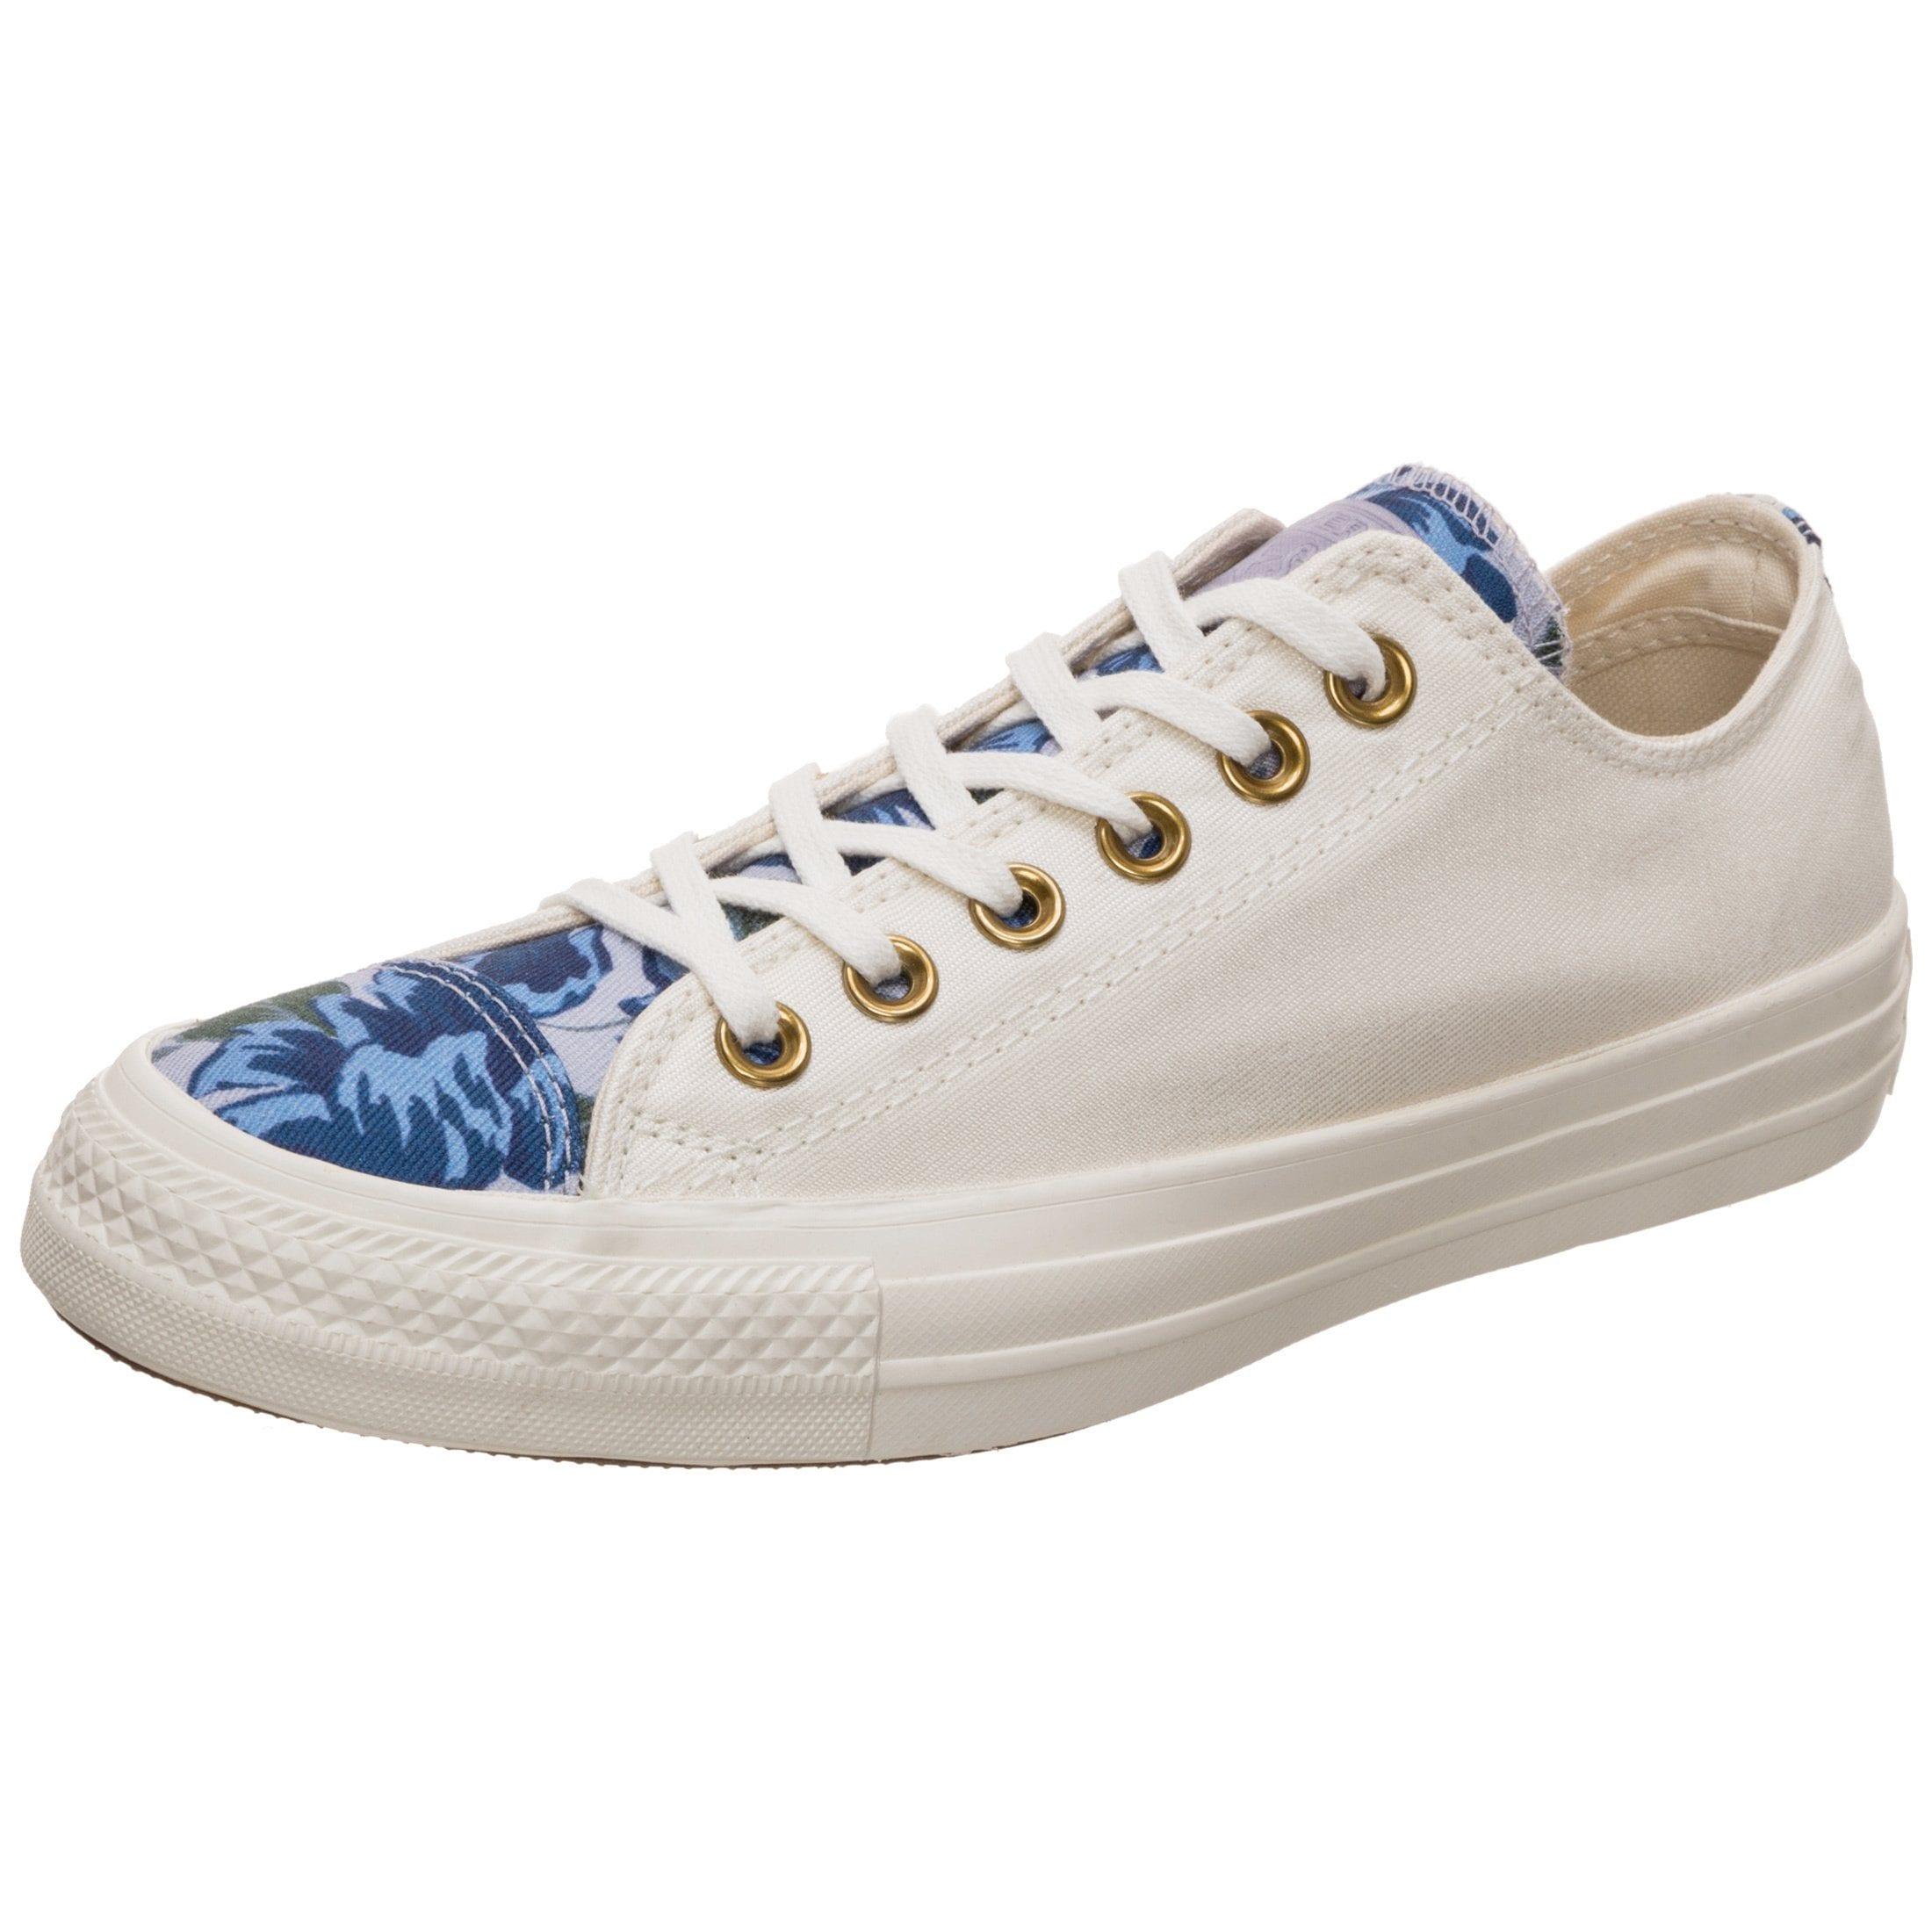 Converse Sneaker »Chuck Taylor All Star Parkway Floral« per Rechnung | BAUR